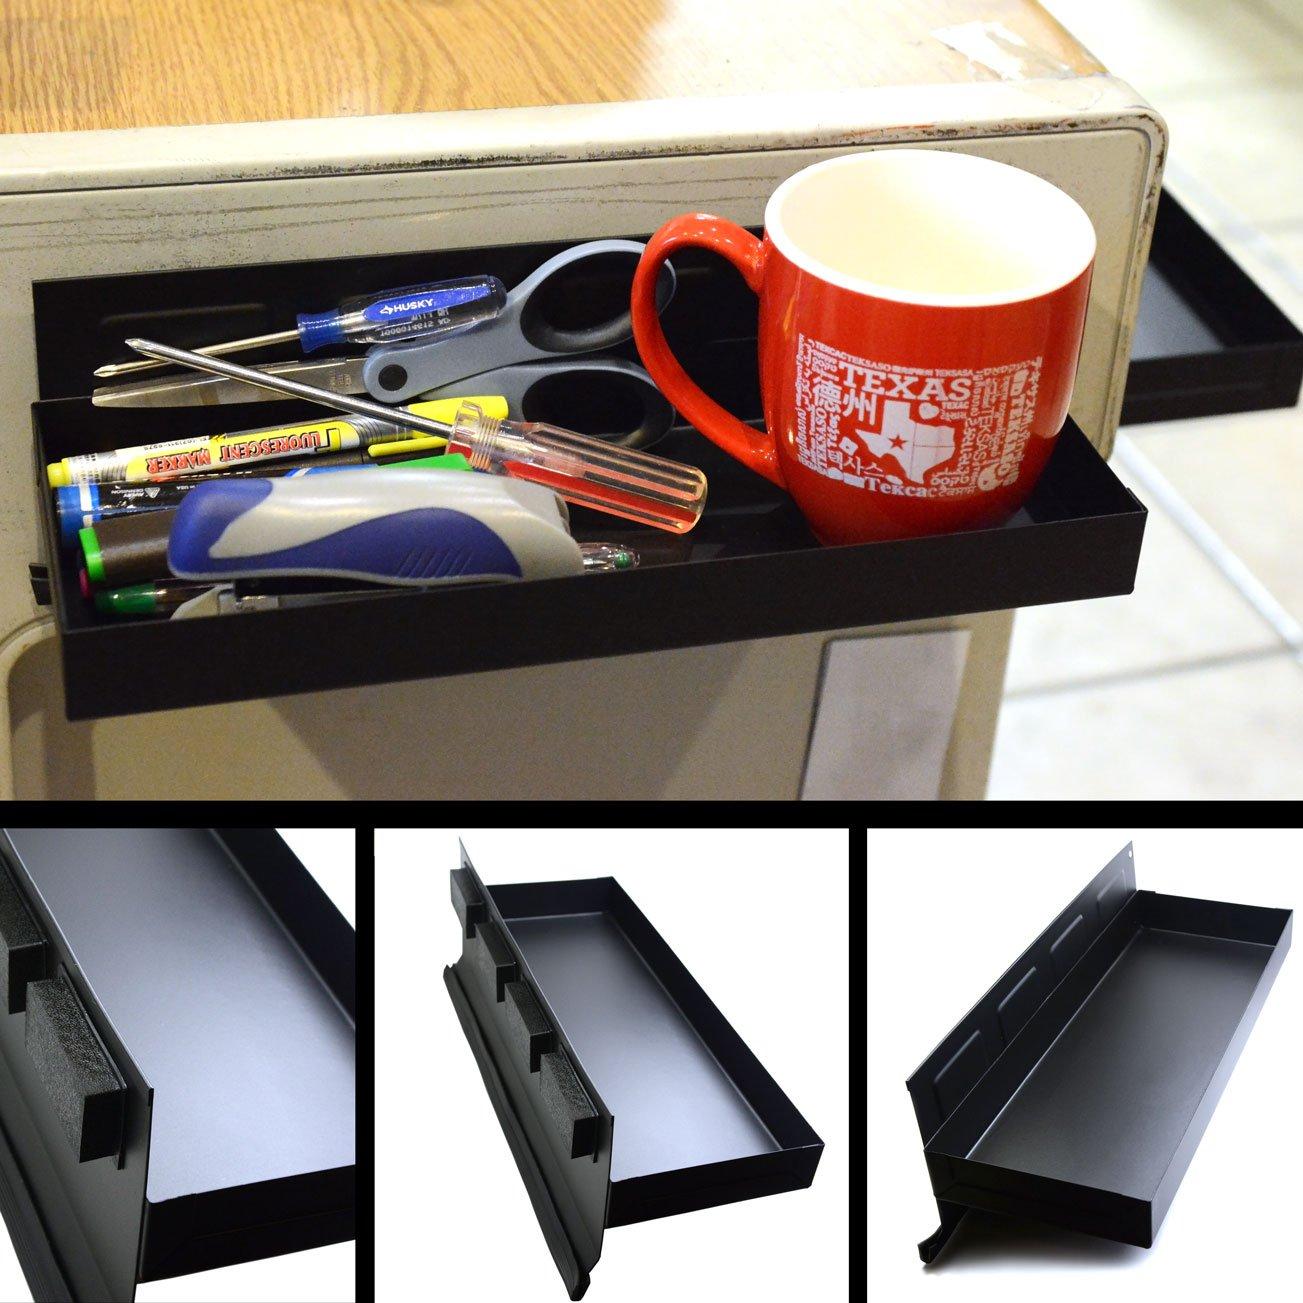 CMS Magnetics Magnetic Tool Tray 12''x4.5''x1.25'' Black Tool Organizer by CMS MAGNETICS